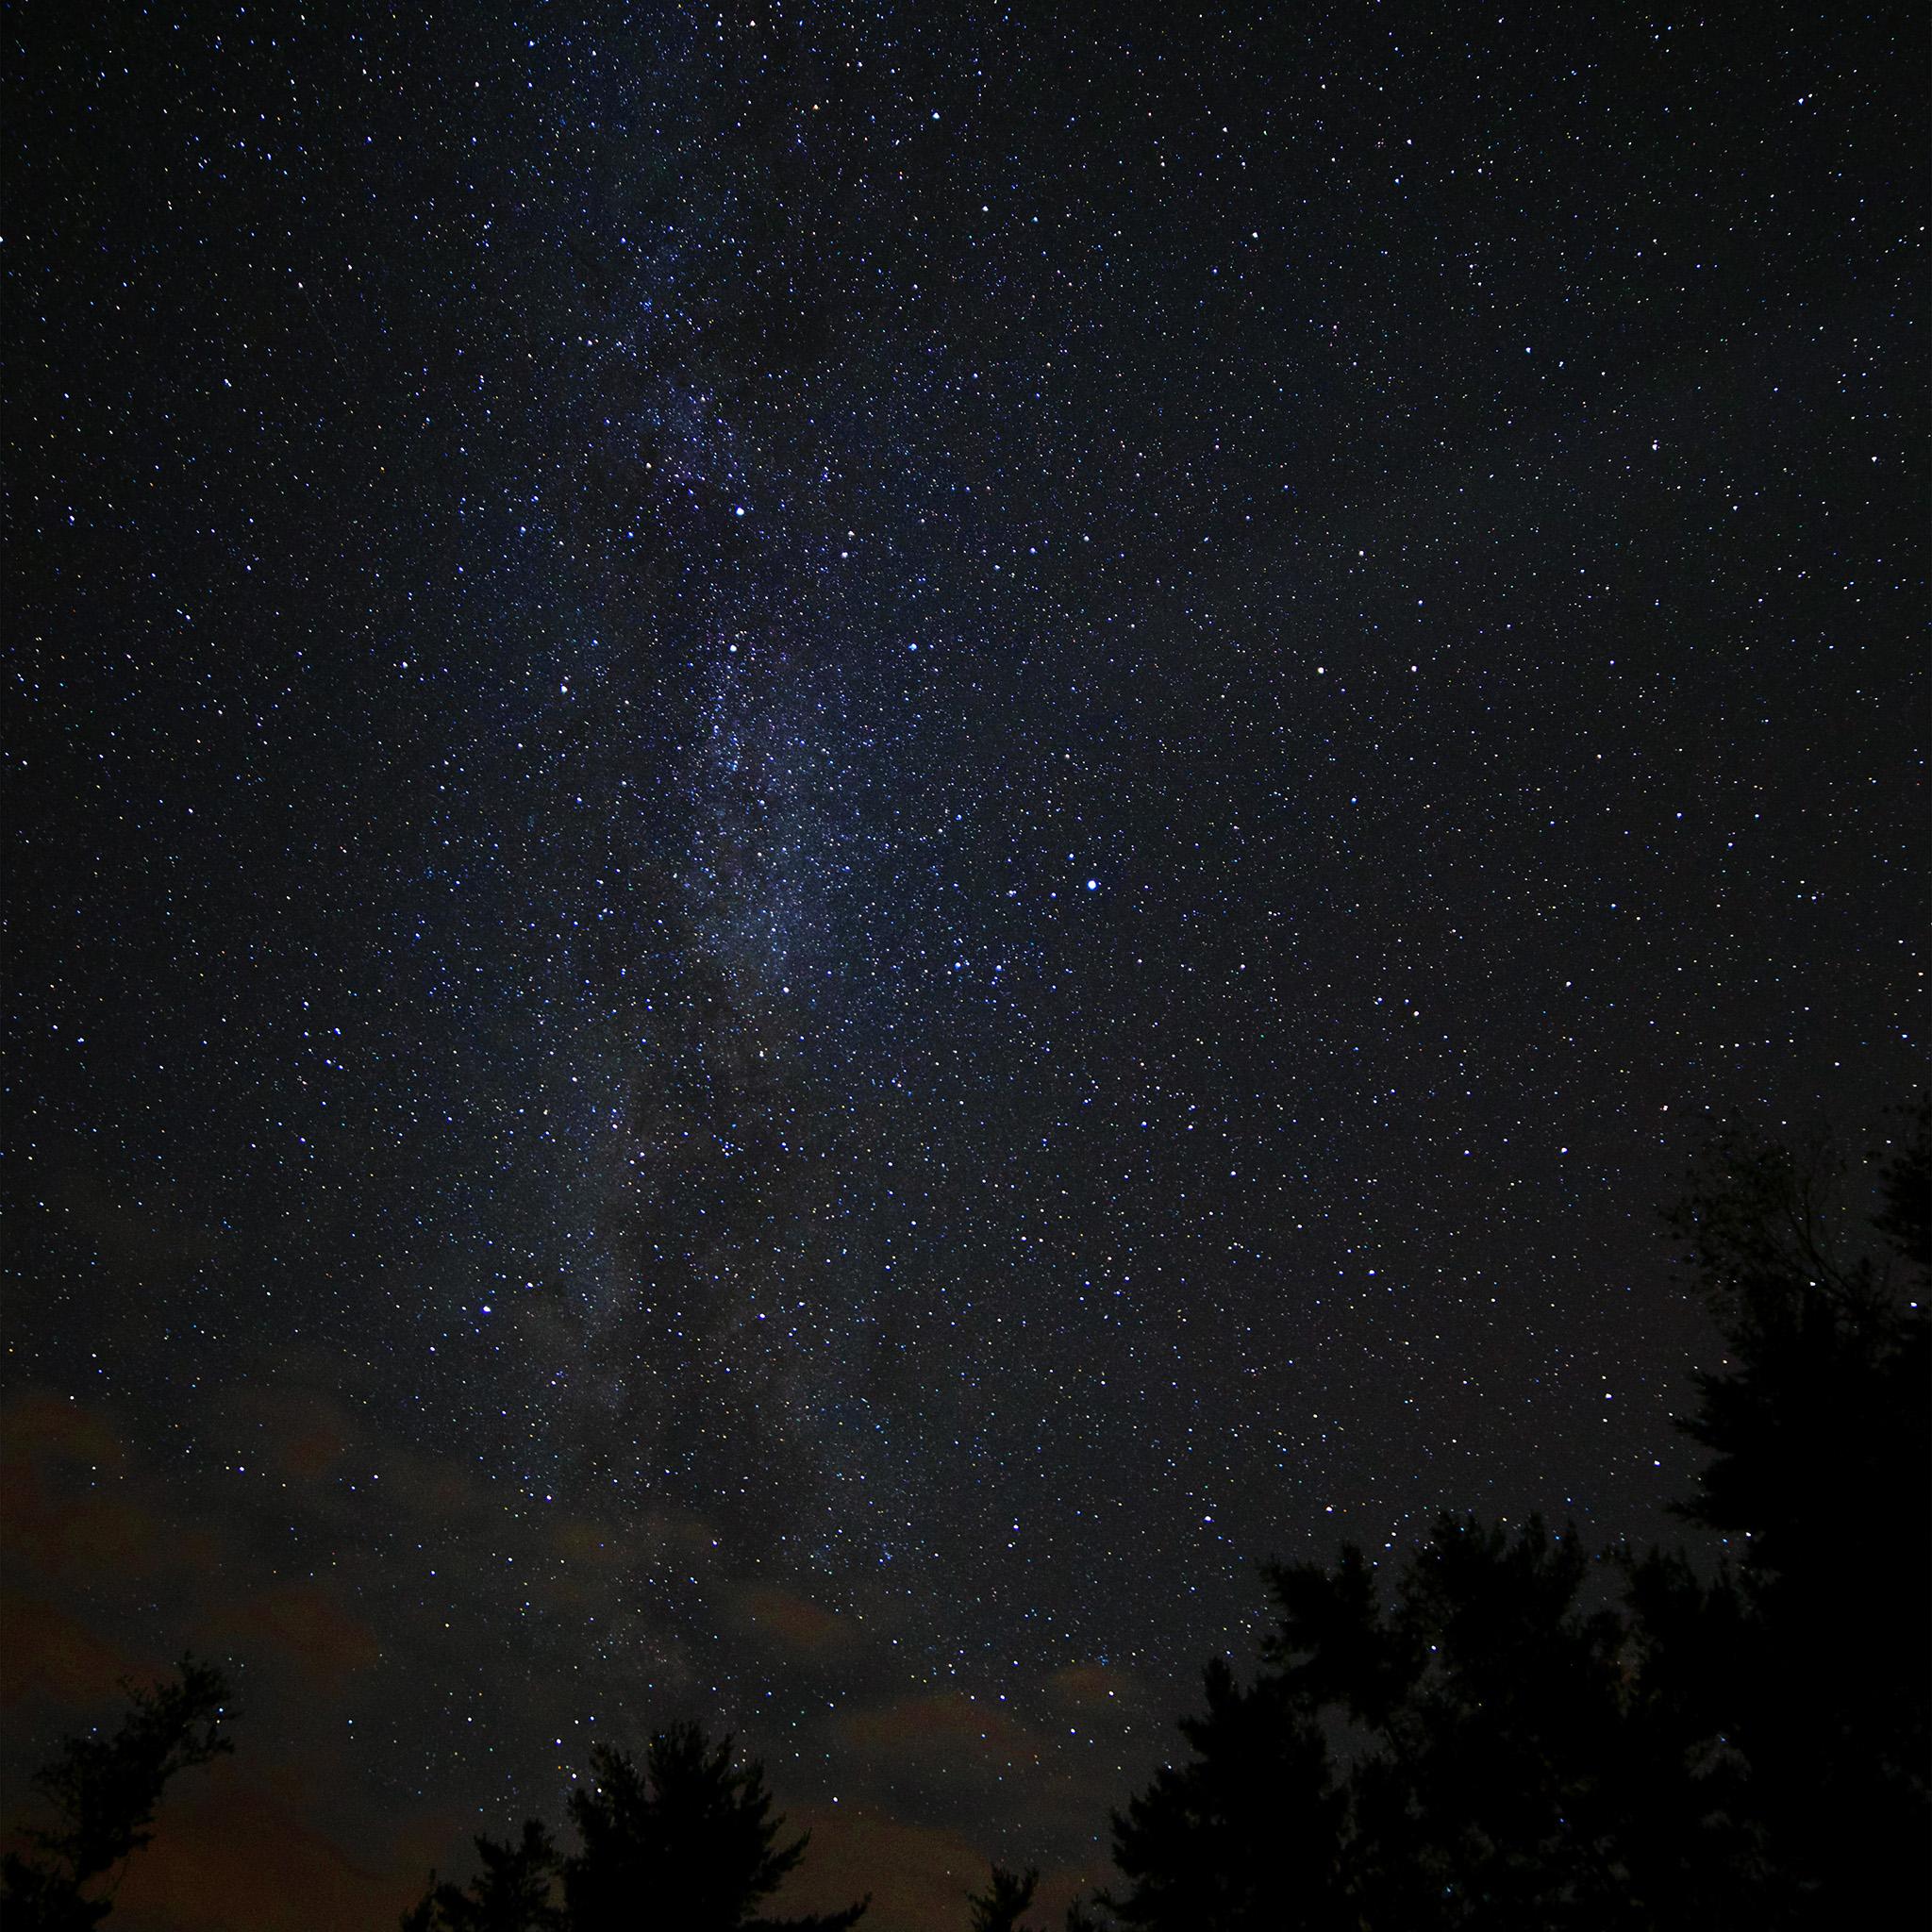 Milky Way Wallpaper: Large